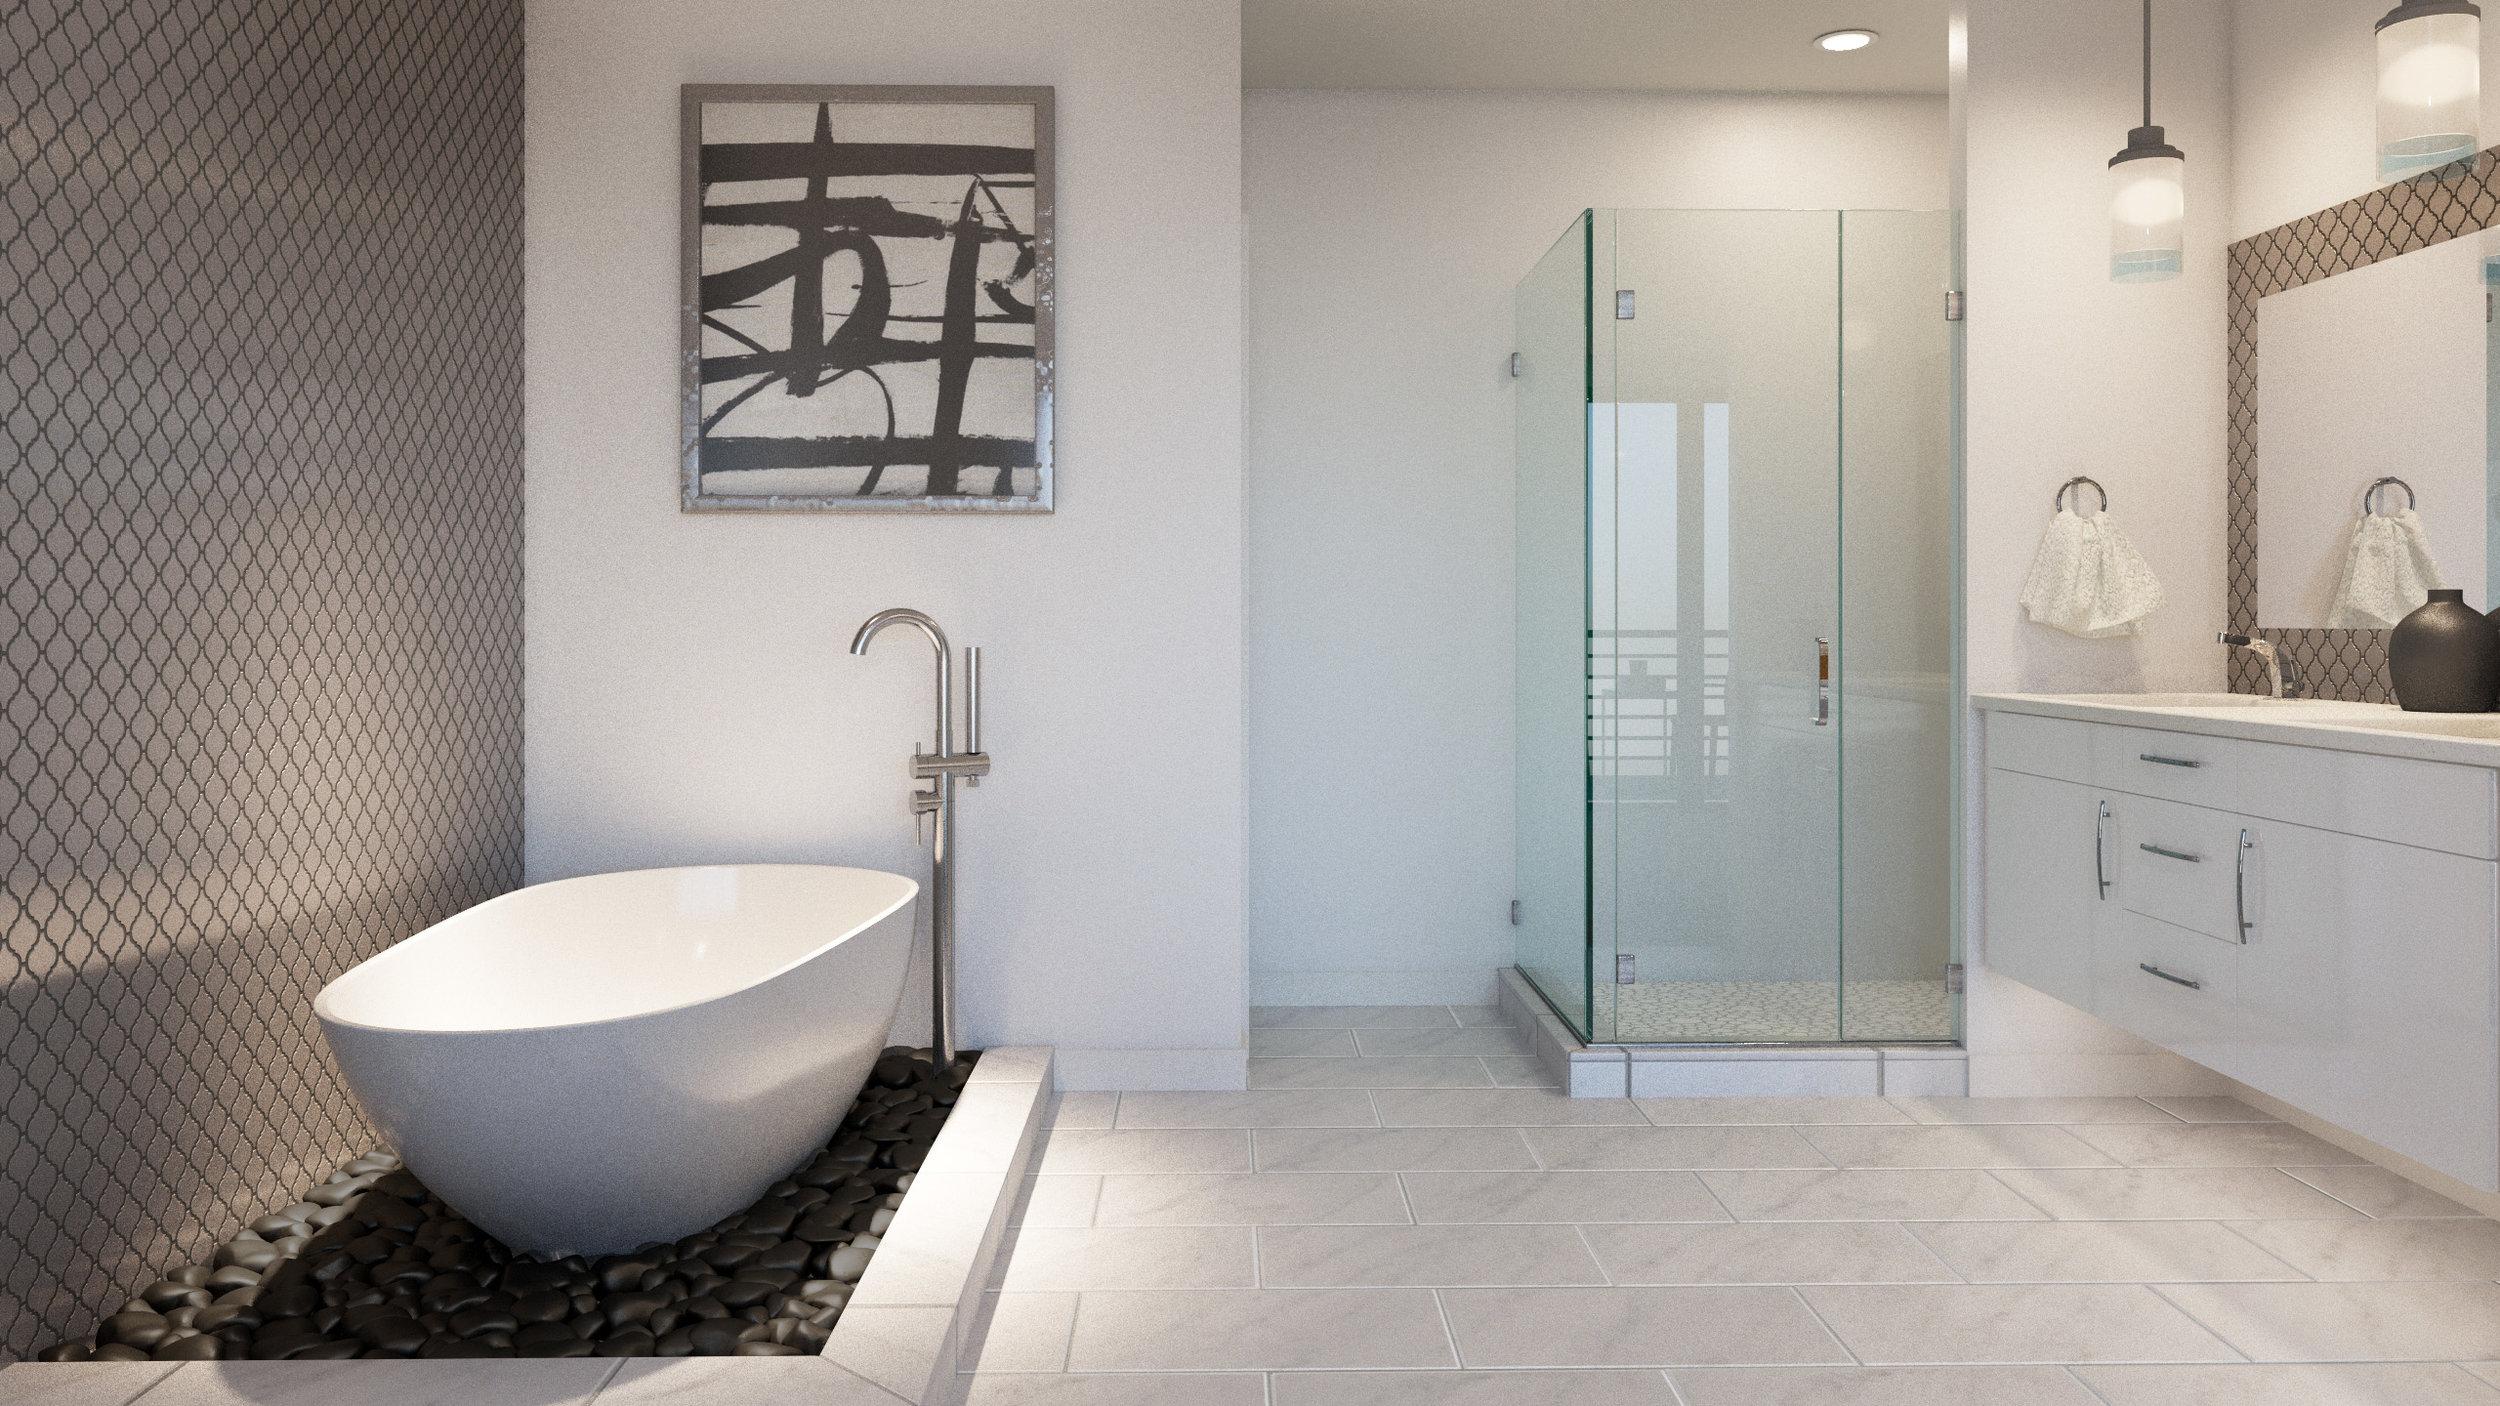 King_Interiors_Bathroom_3A_2560.jpg